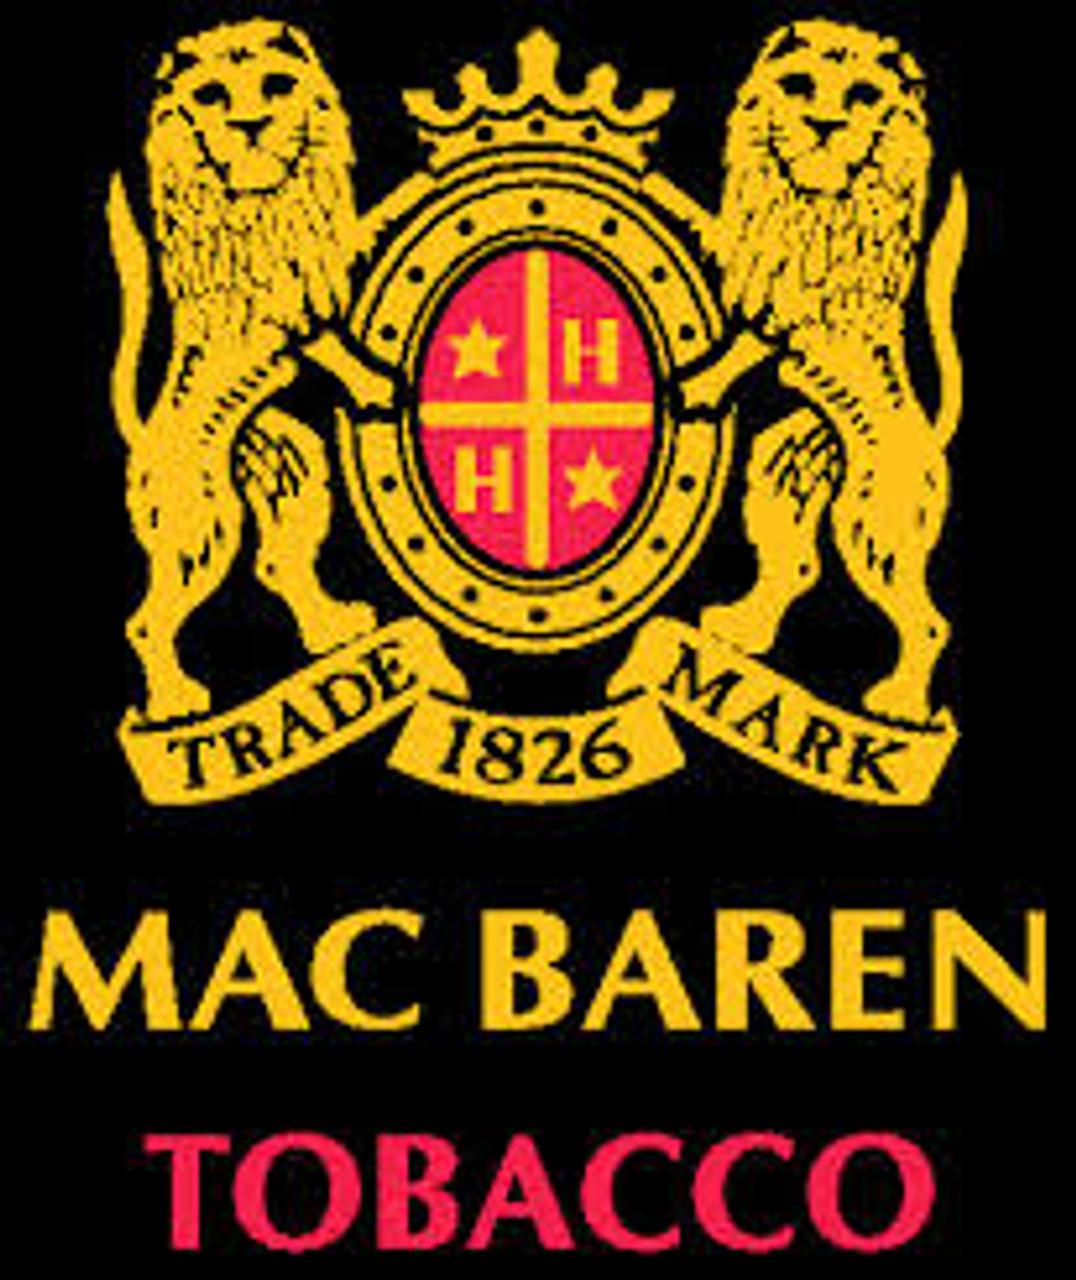 Mac Baren Modern Virginia Flake Cut Pipe Tobacco | 1.75 OZ. TIN